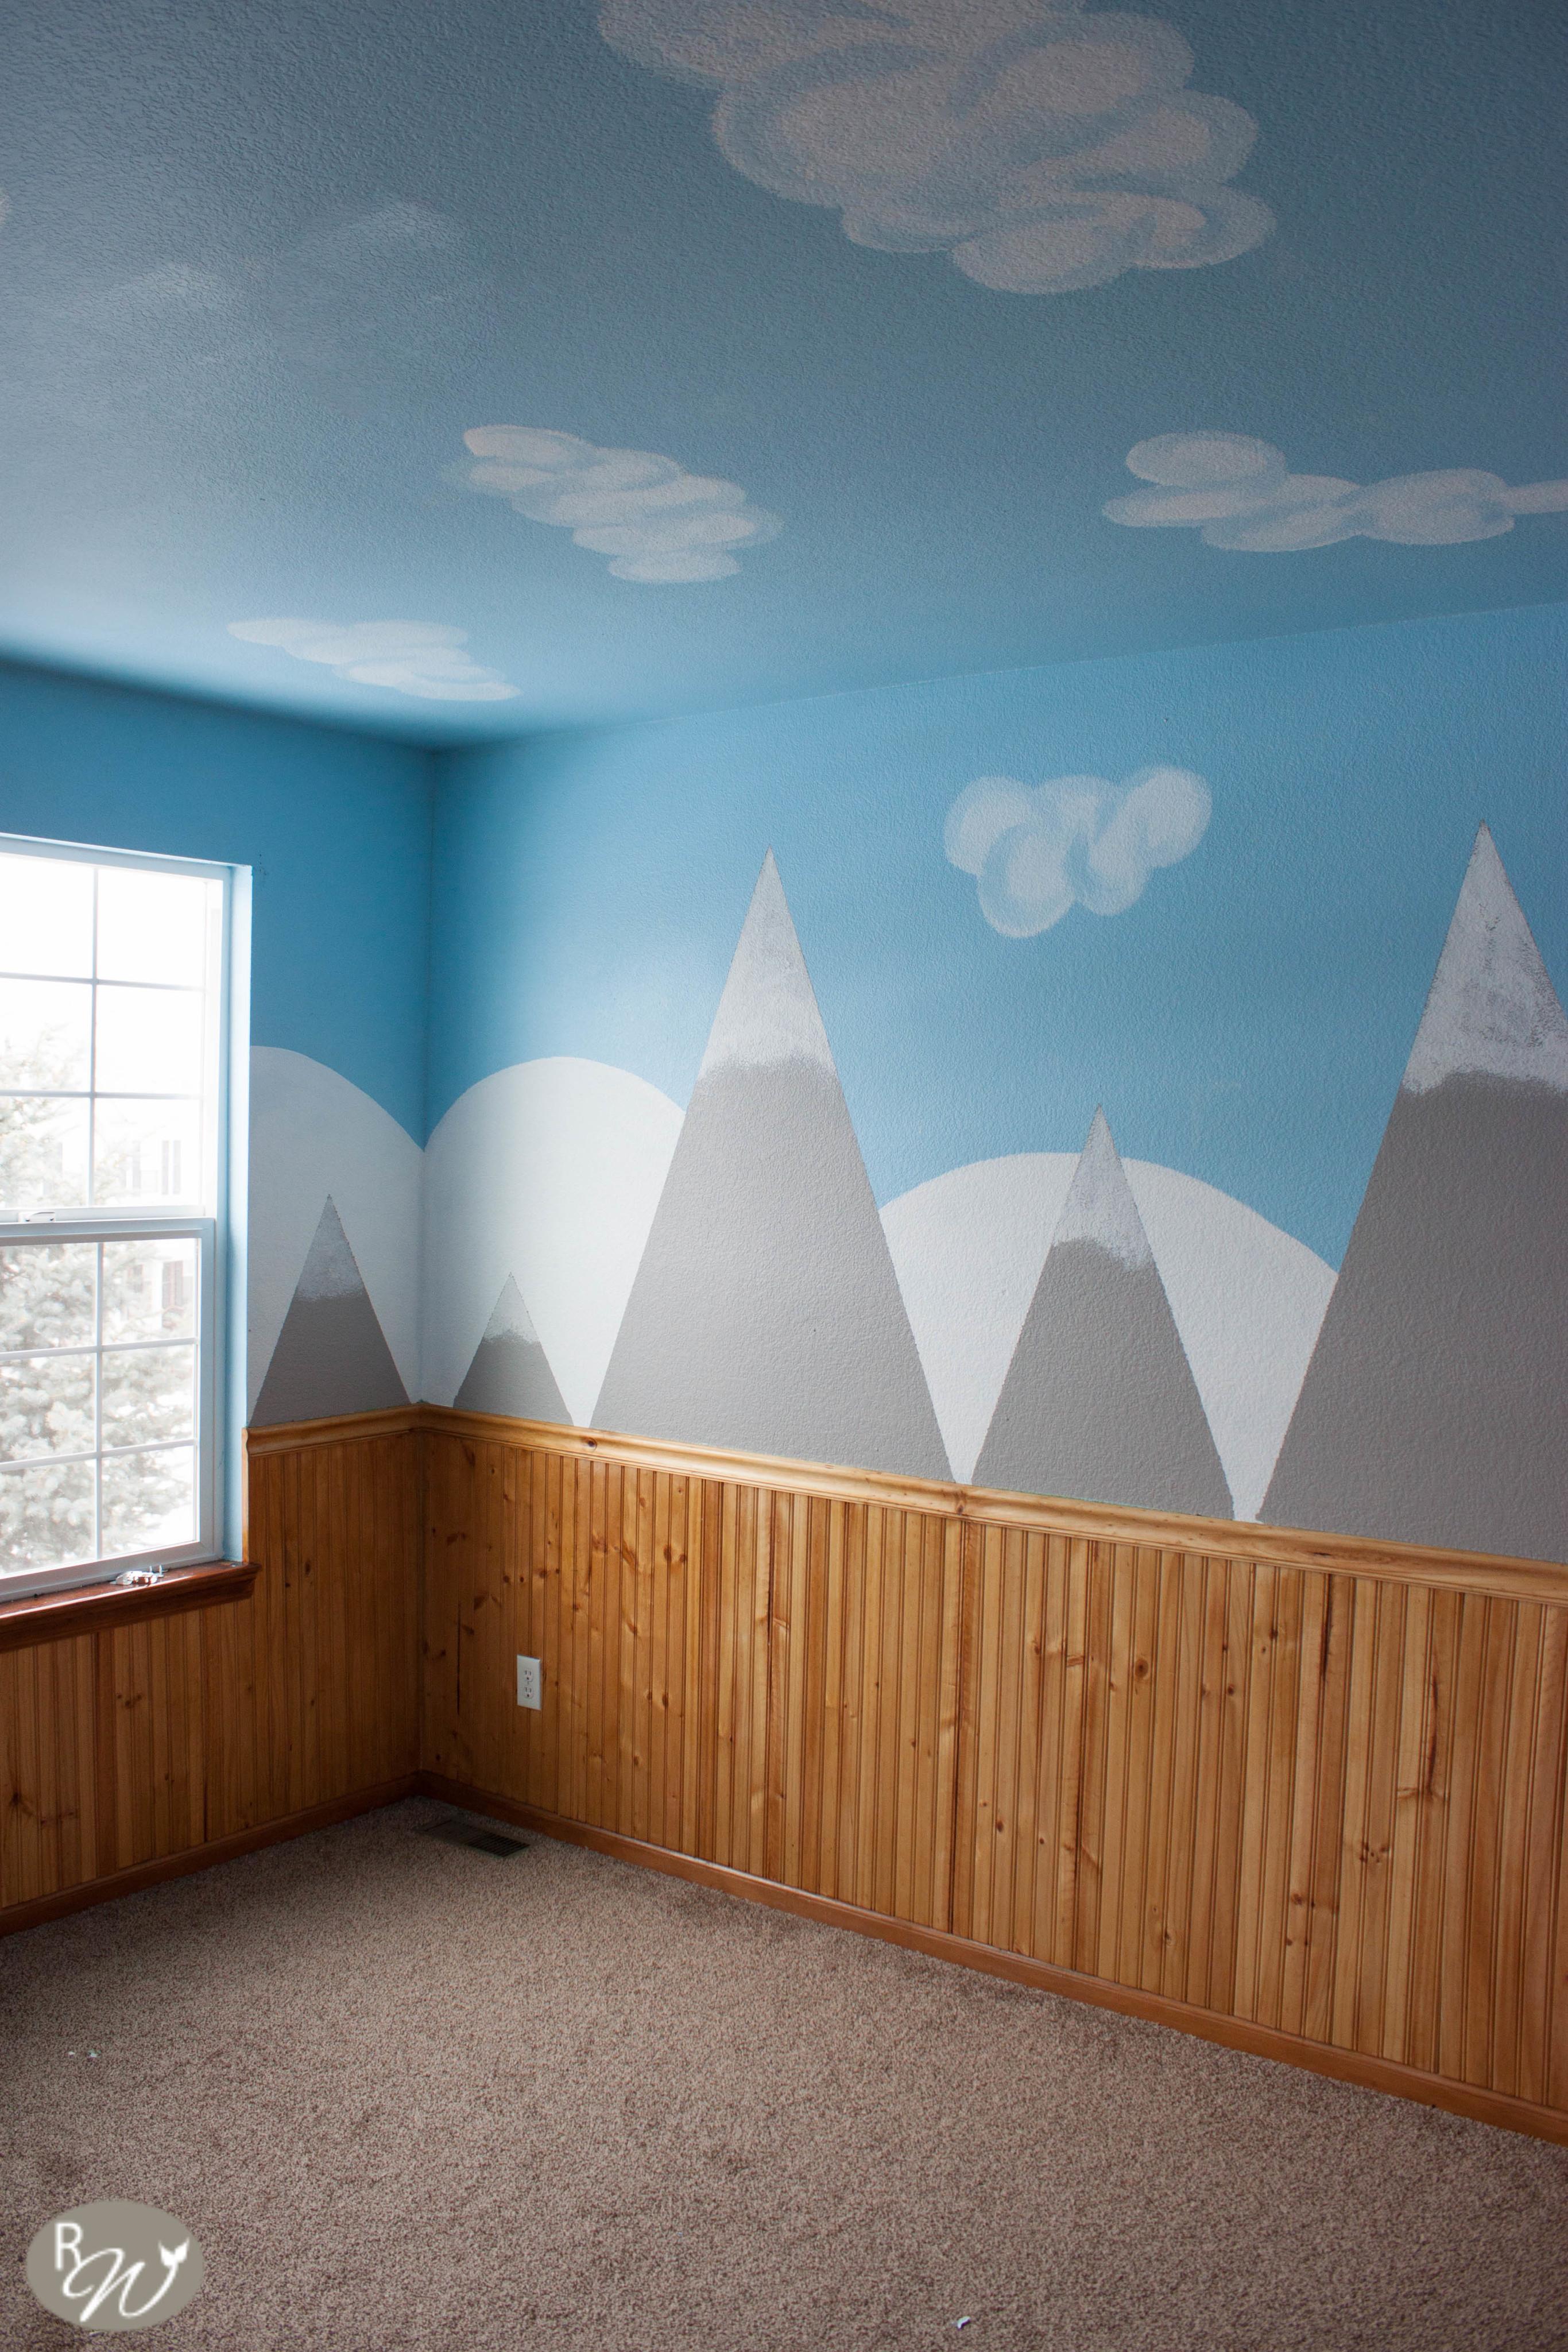 Diy Mountain Wall Tutorial 183 How To Make Wallpaper A